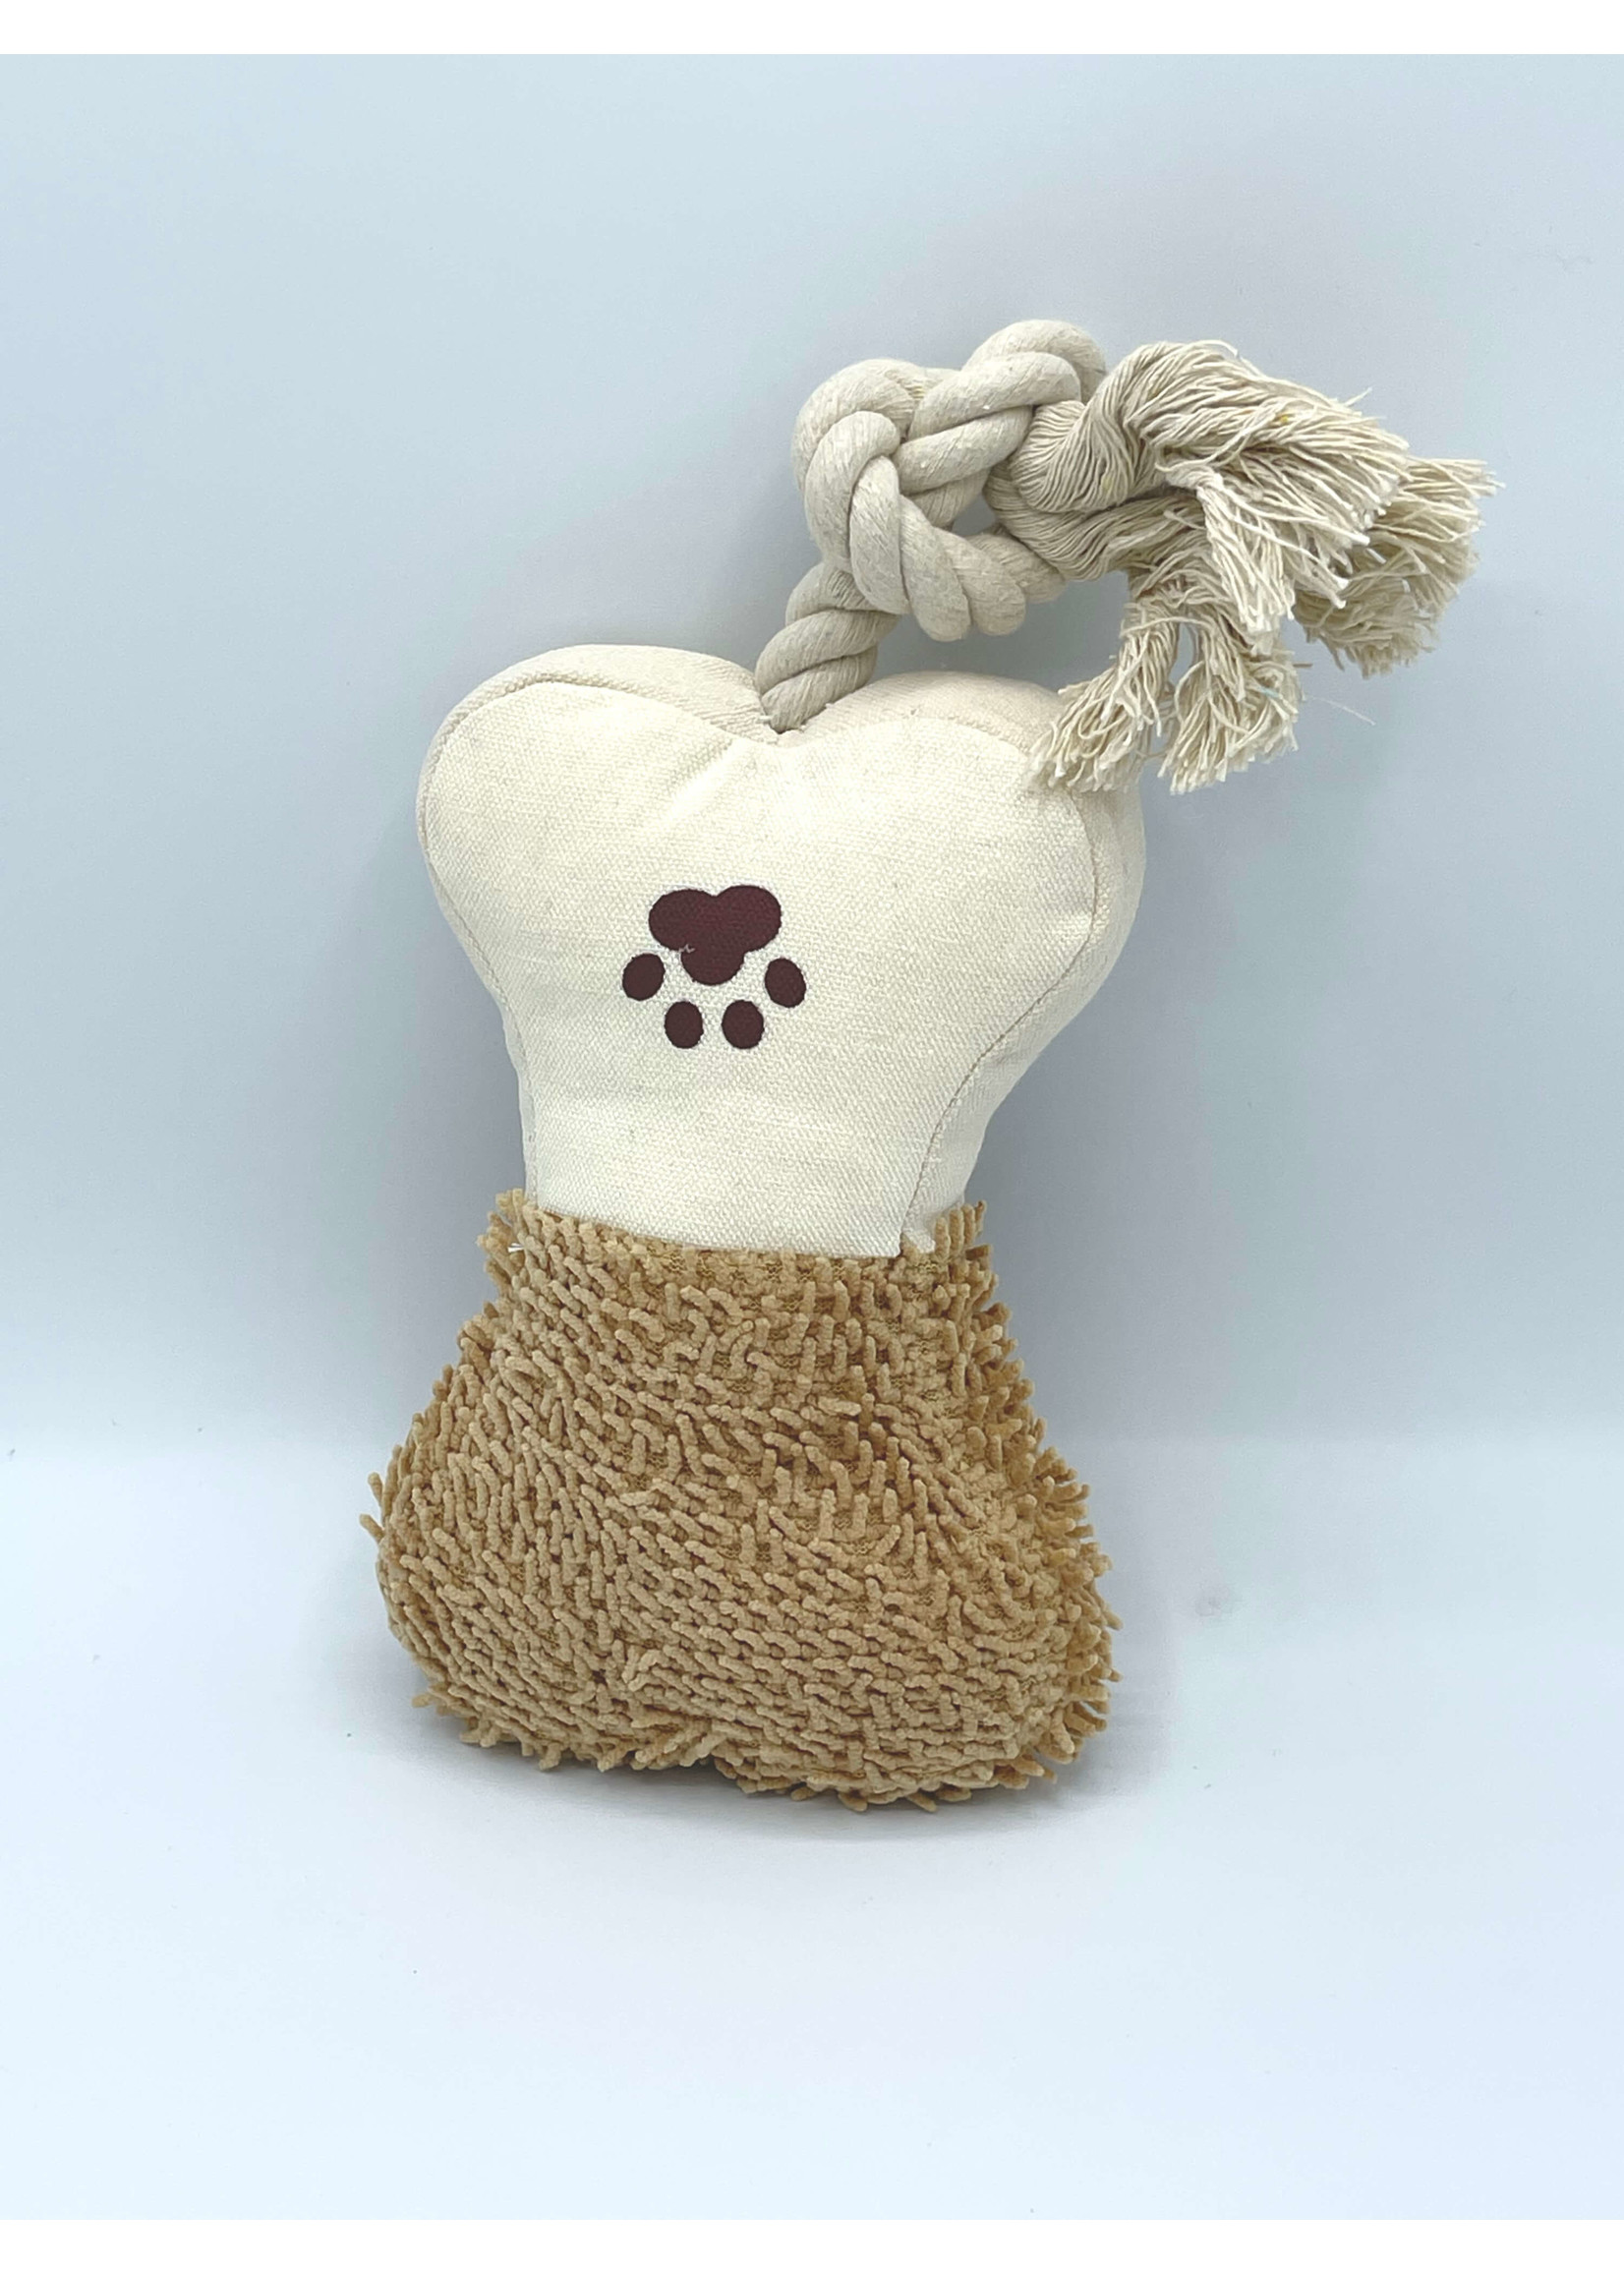 Bite Resistance Plush Rope Dog Toy